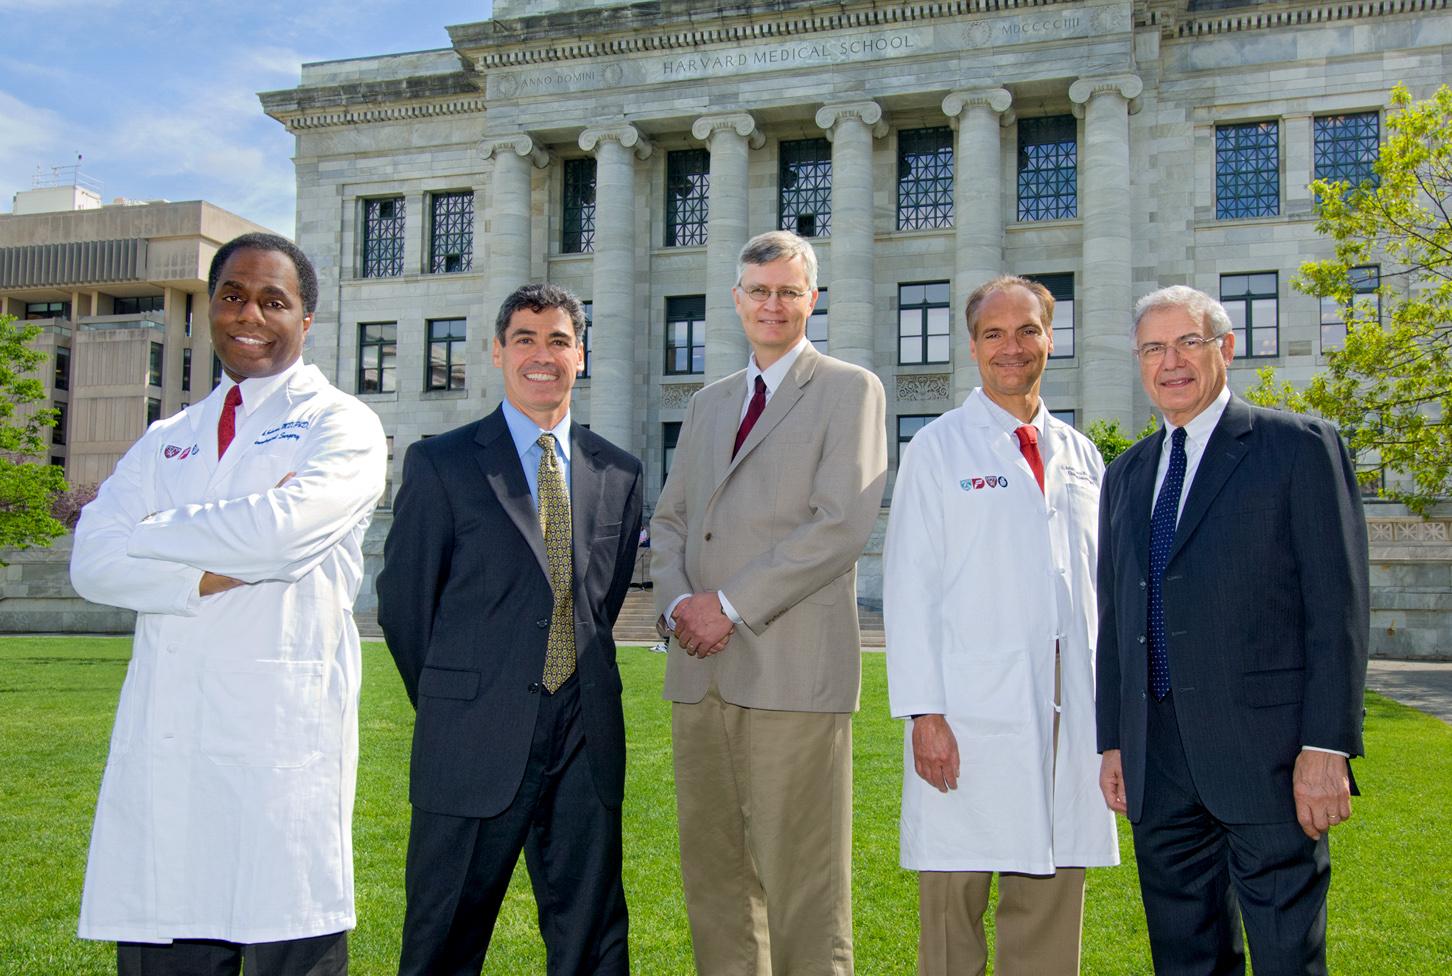 Brigham & Womans surgeons